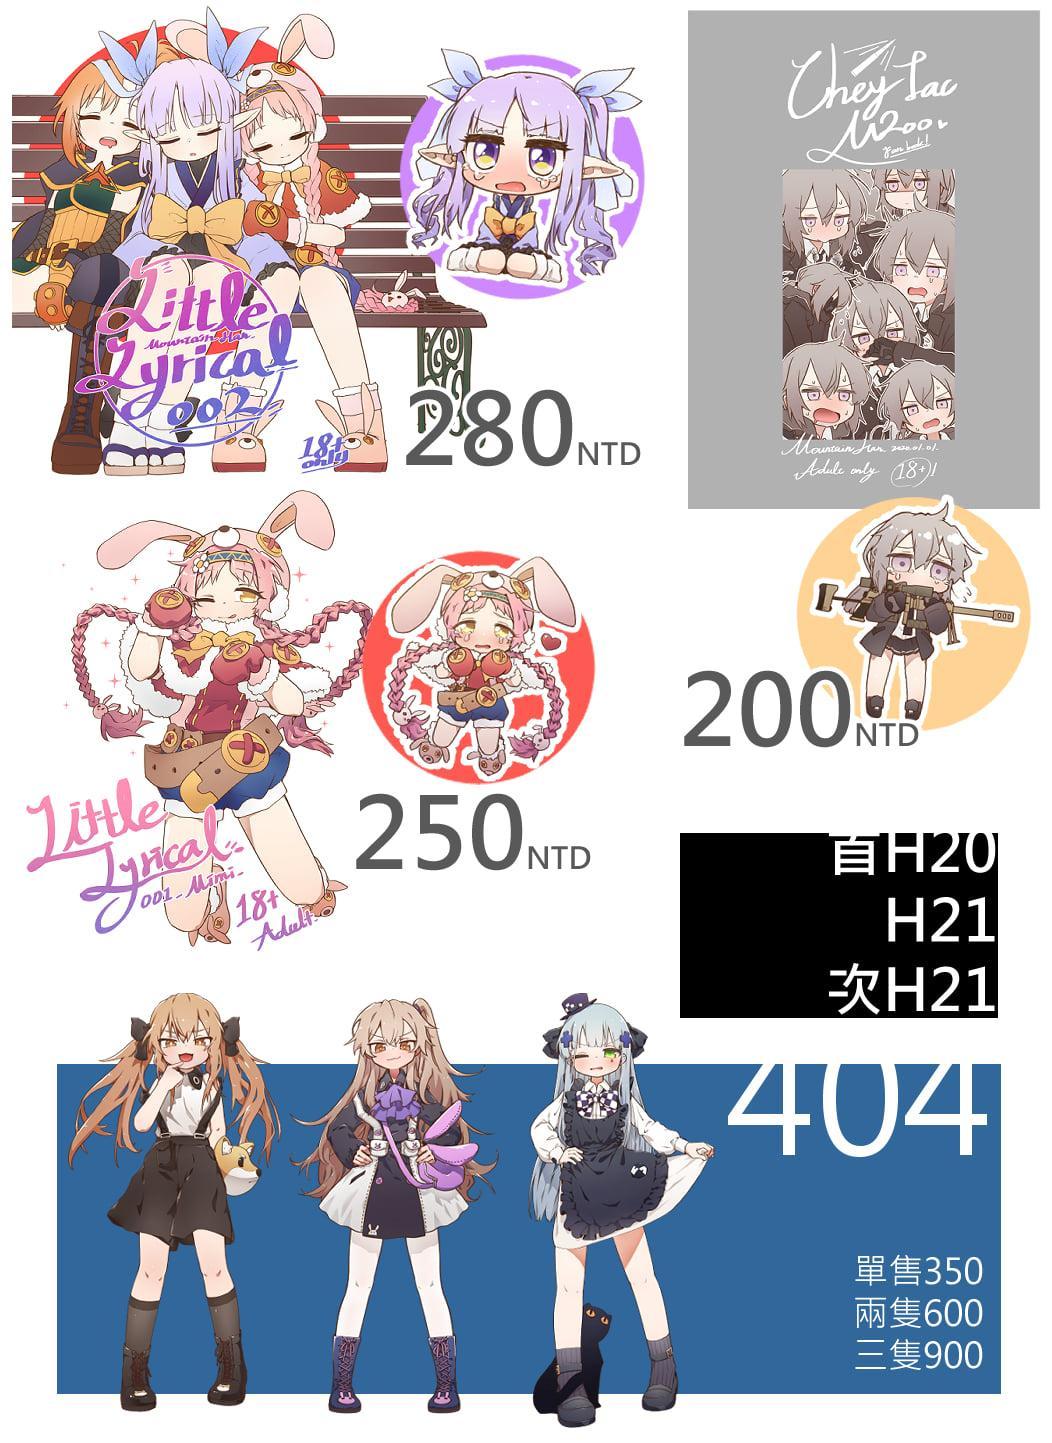 [MountainHan(山含)] Little Lyrical 002 (Princess Connect! Re:Dive) [Chinese] [切嚕系女子個人搬運] [Decensored] +小宣傳 35